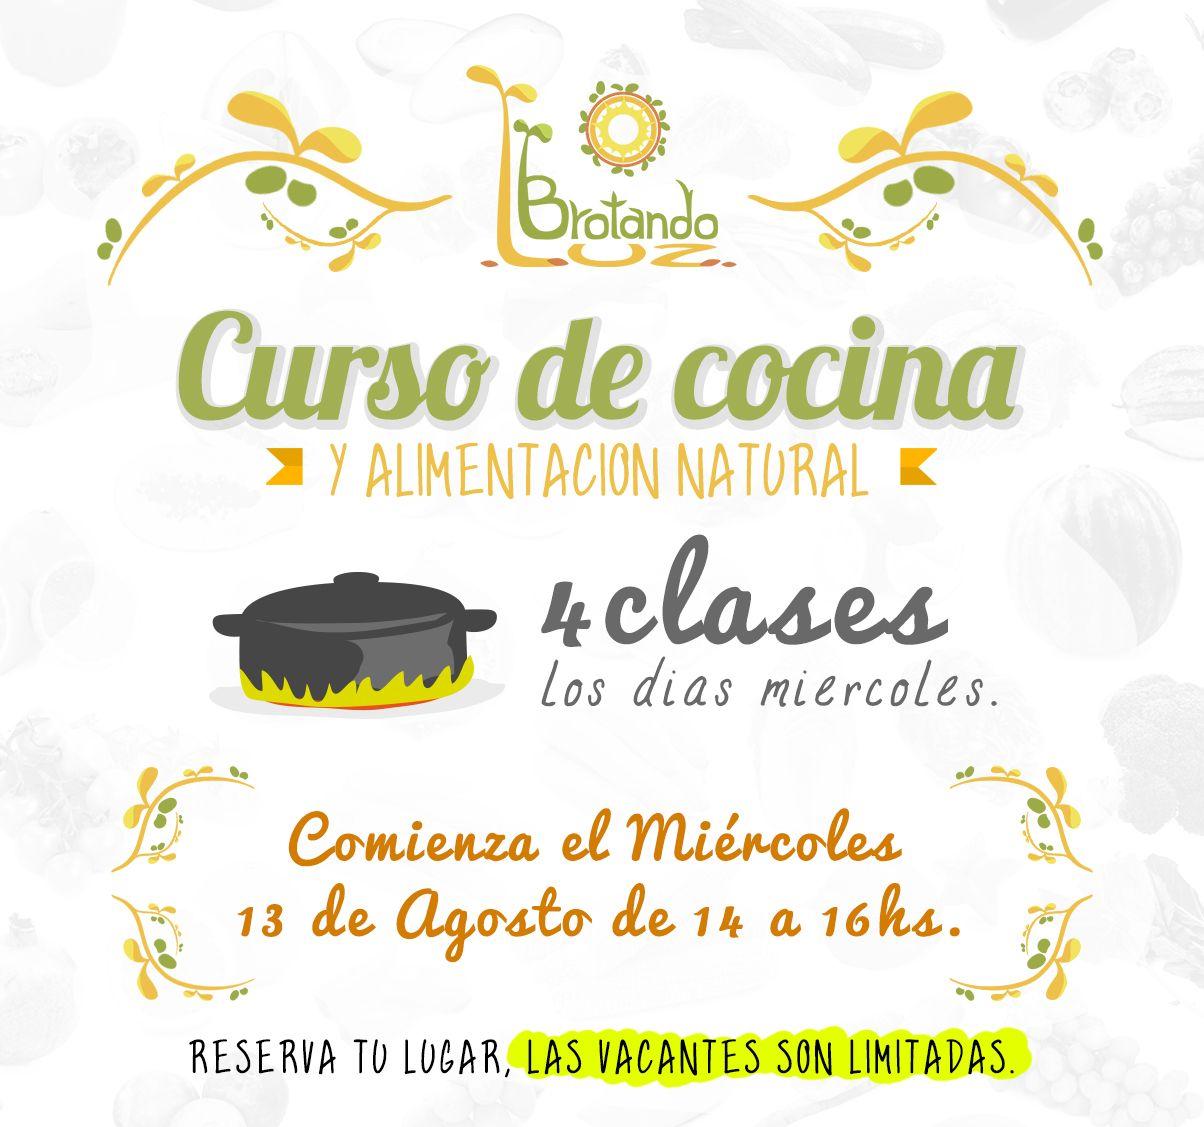 Curso de cocina saludable   curso de cocina   Pinterest   Cocina ...